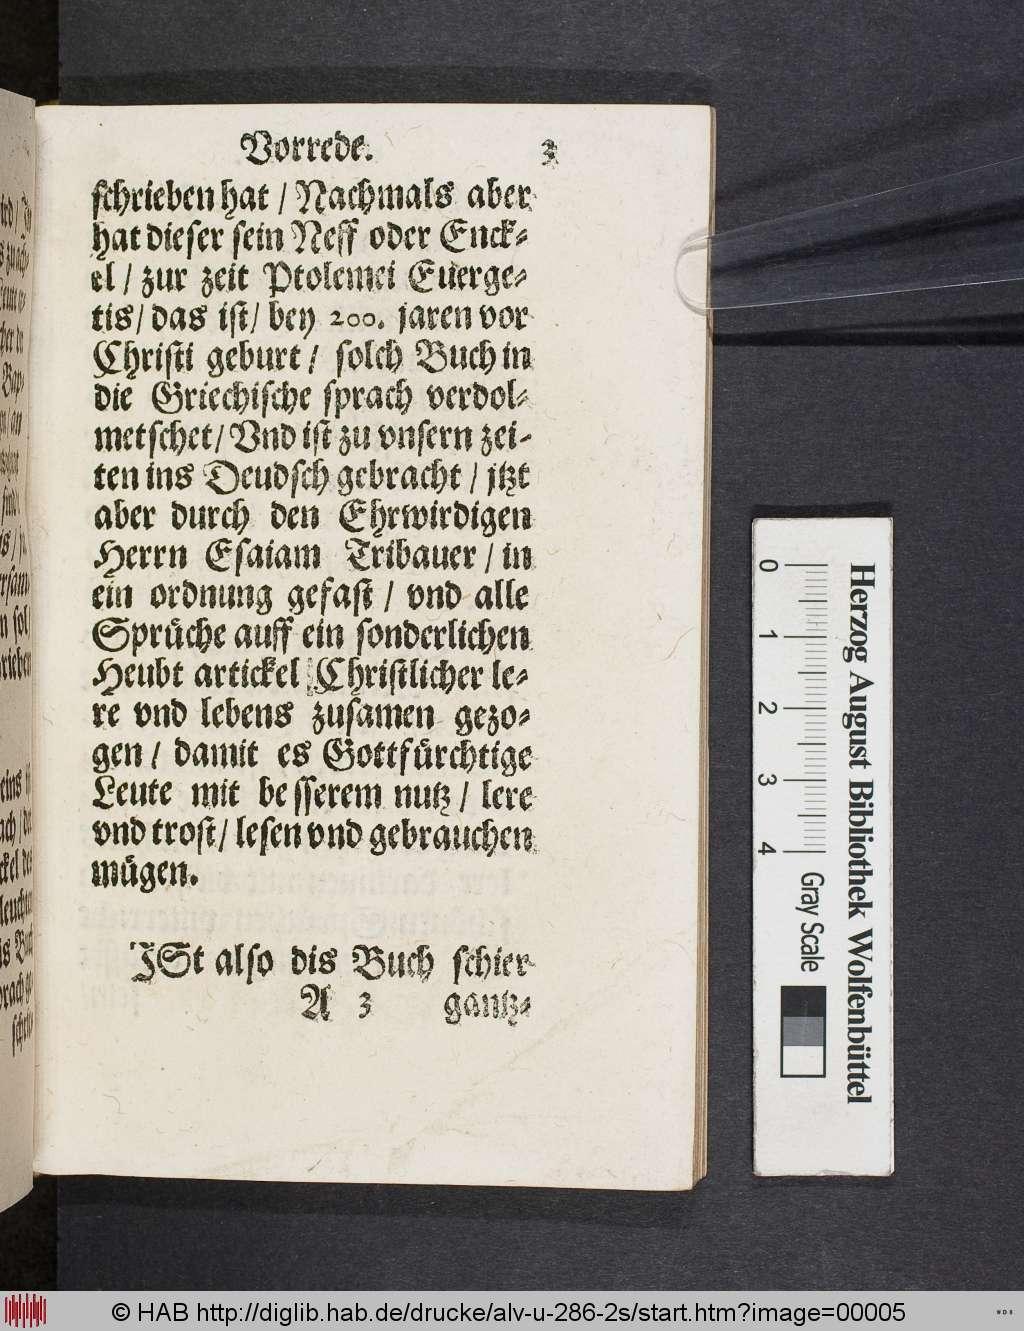 http://diglib.hab.de/drucke/alv-u-286-2s/00005.jpg